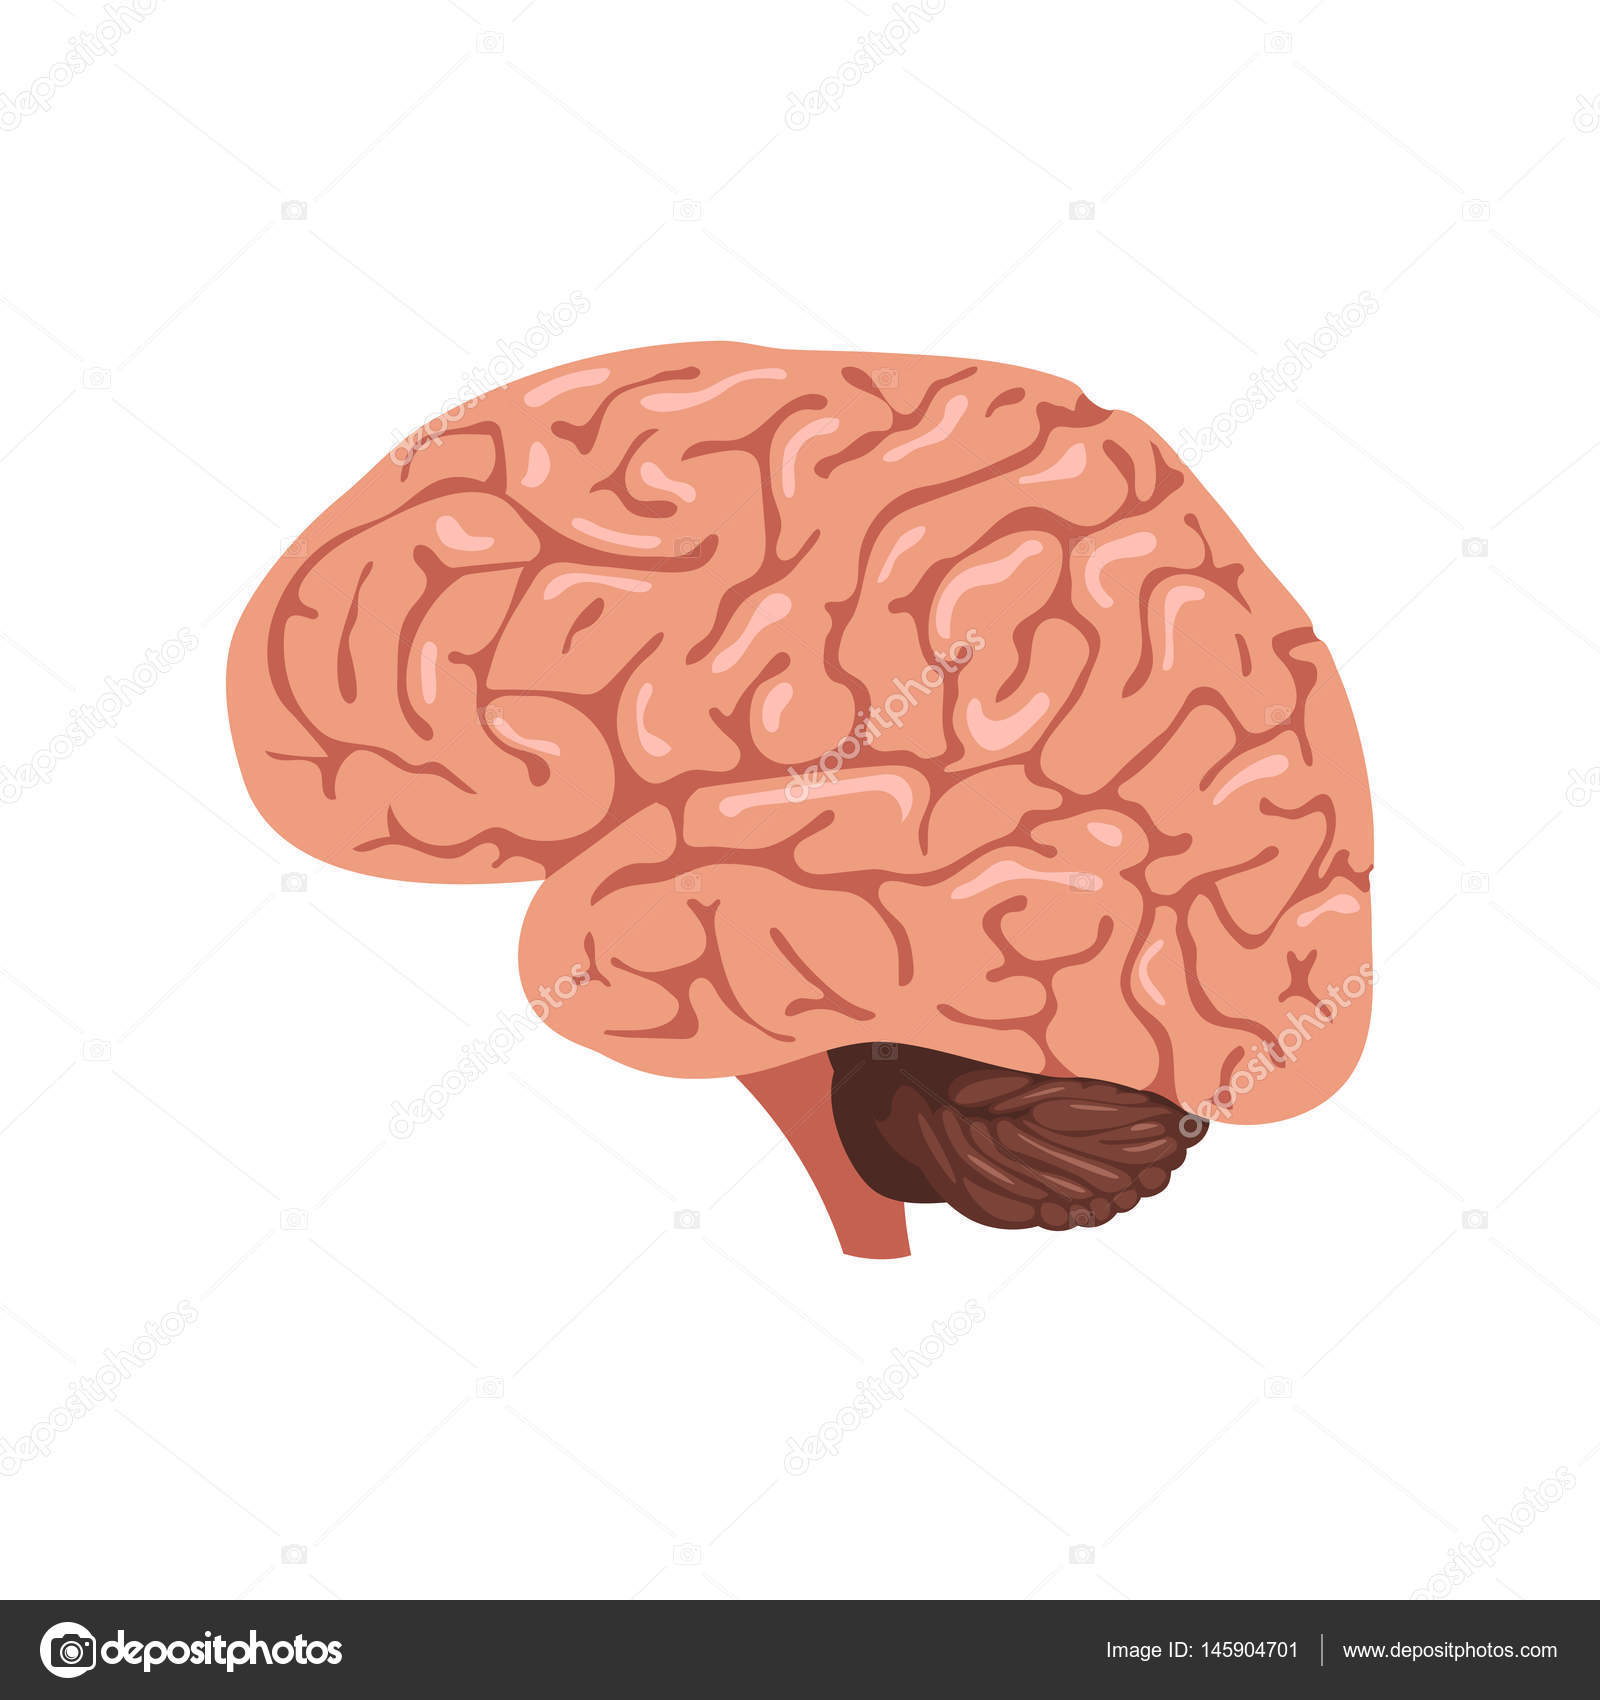 Anatomie des Gehirns Symbol — Stockvektor © EgudinKa #145904701